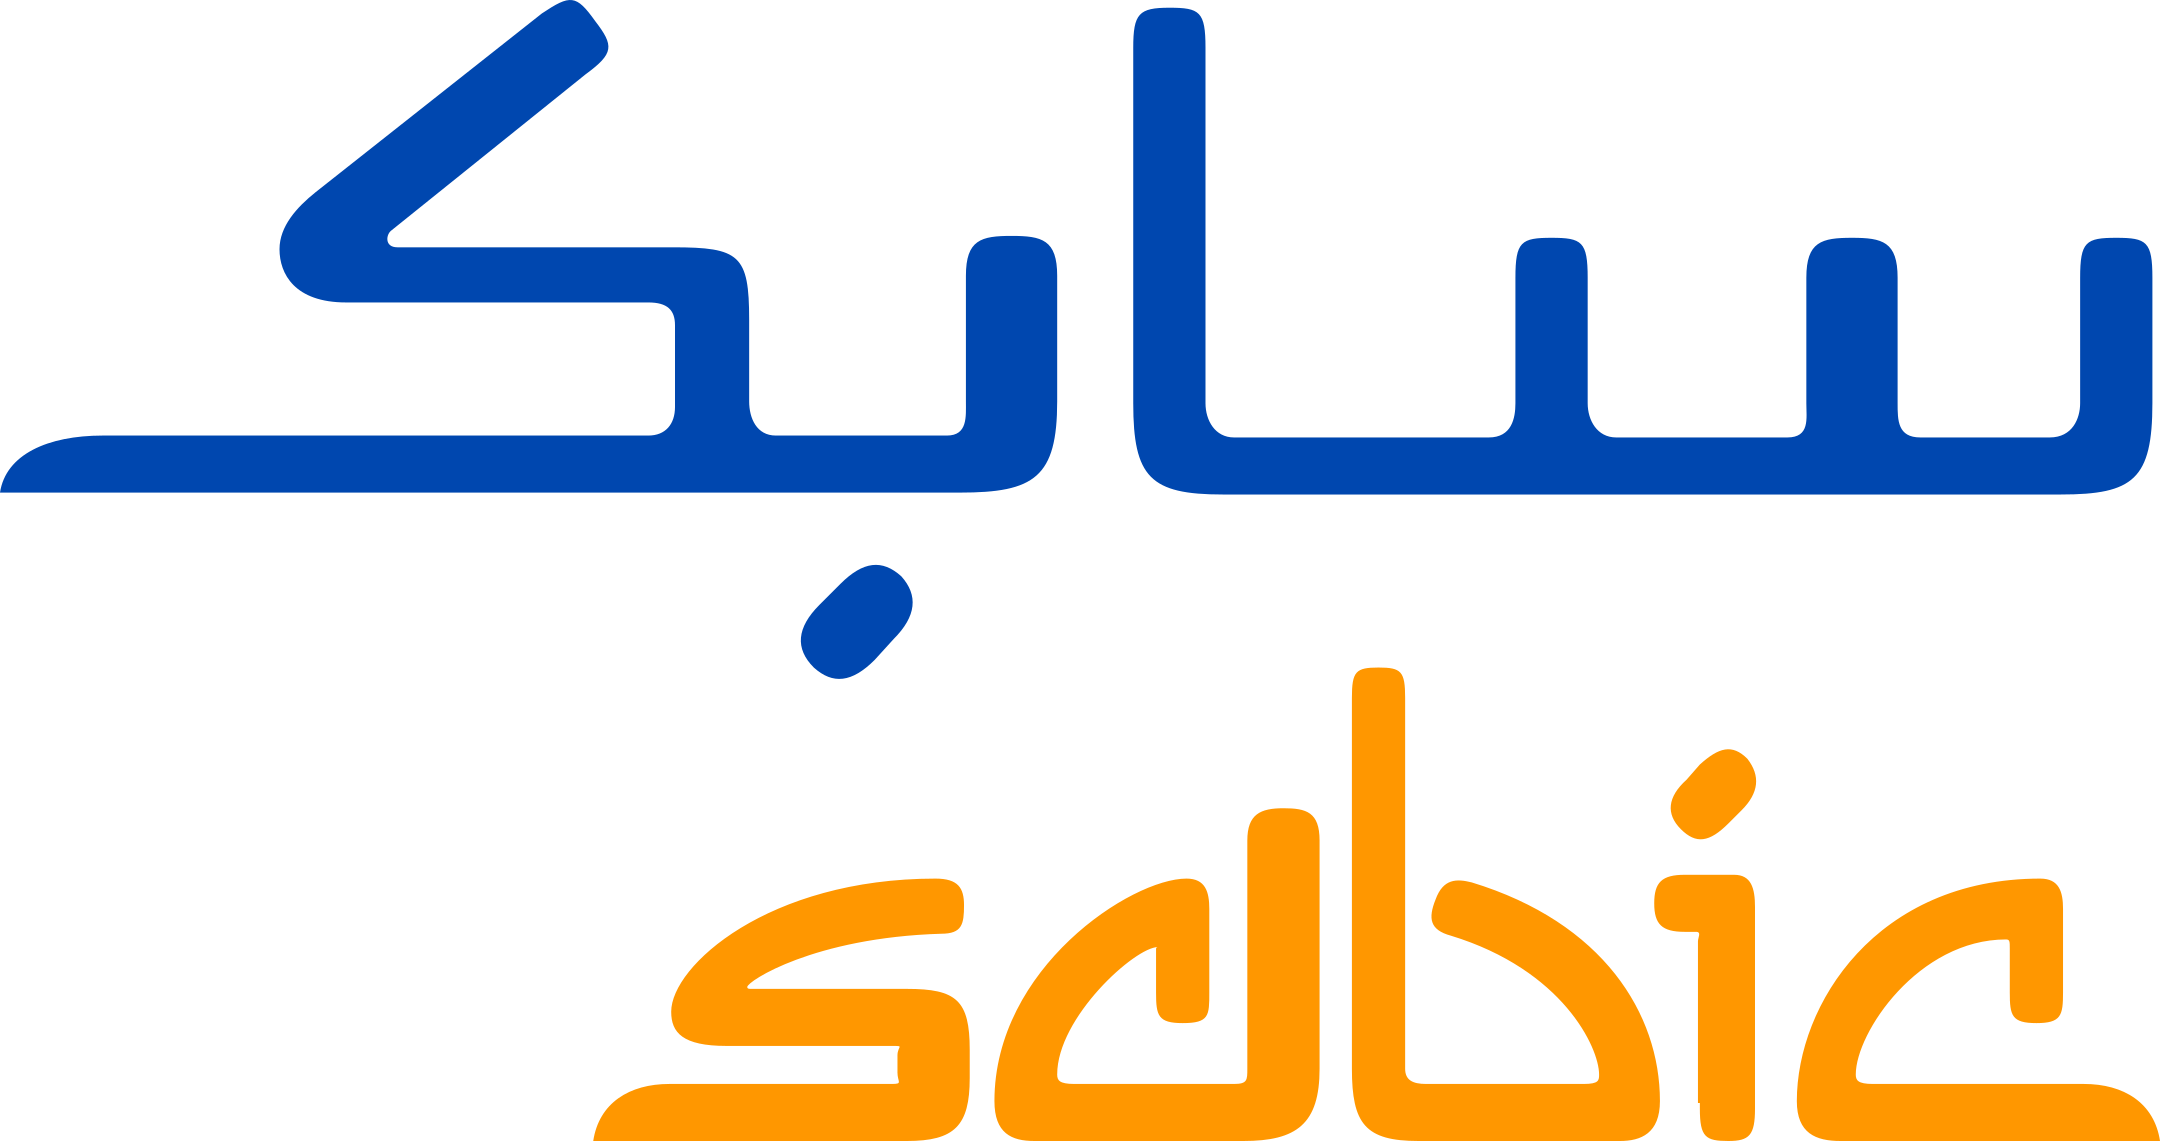 sabic logo 1 - Sabic Logo